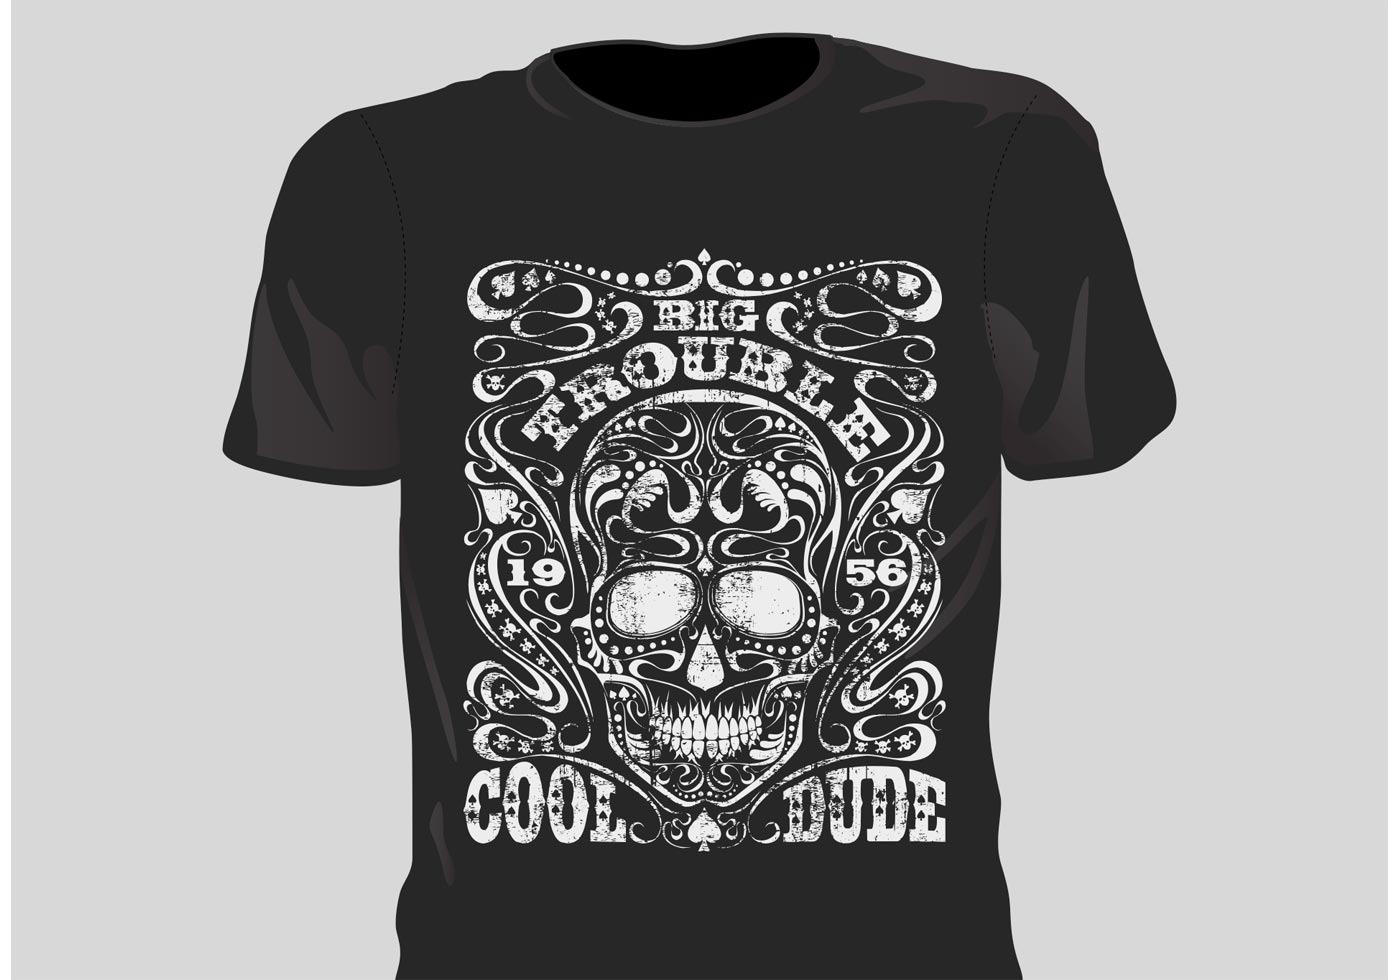 T shirt design vectors -  Vector Grunge T Shirt Design Download